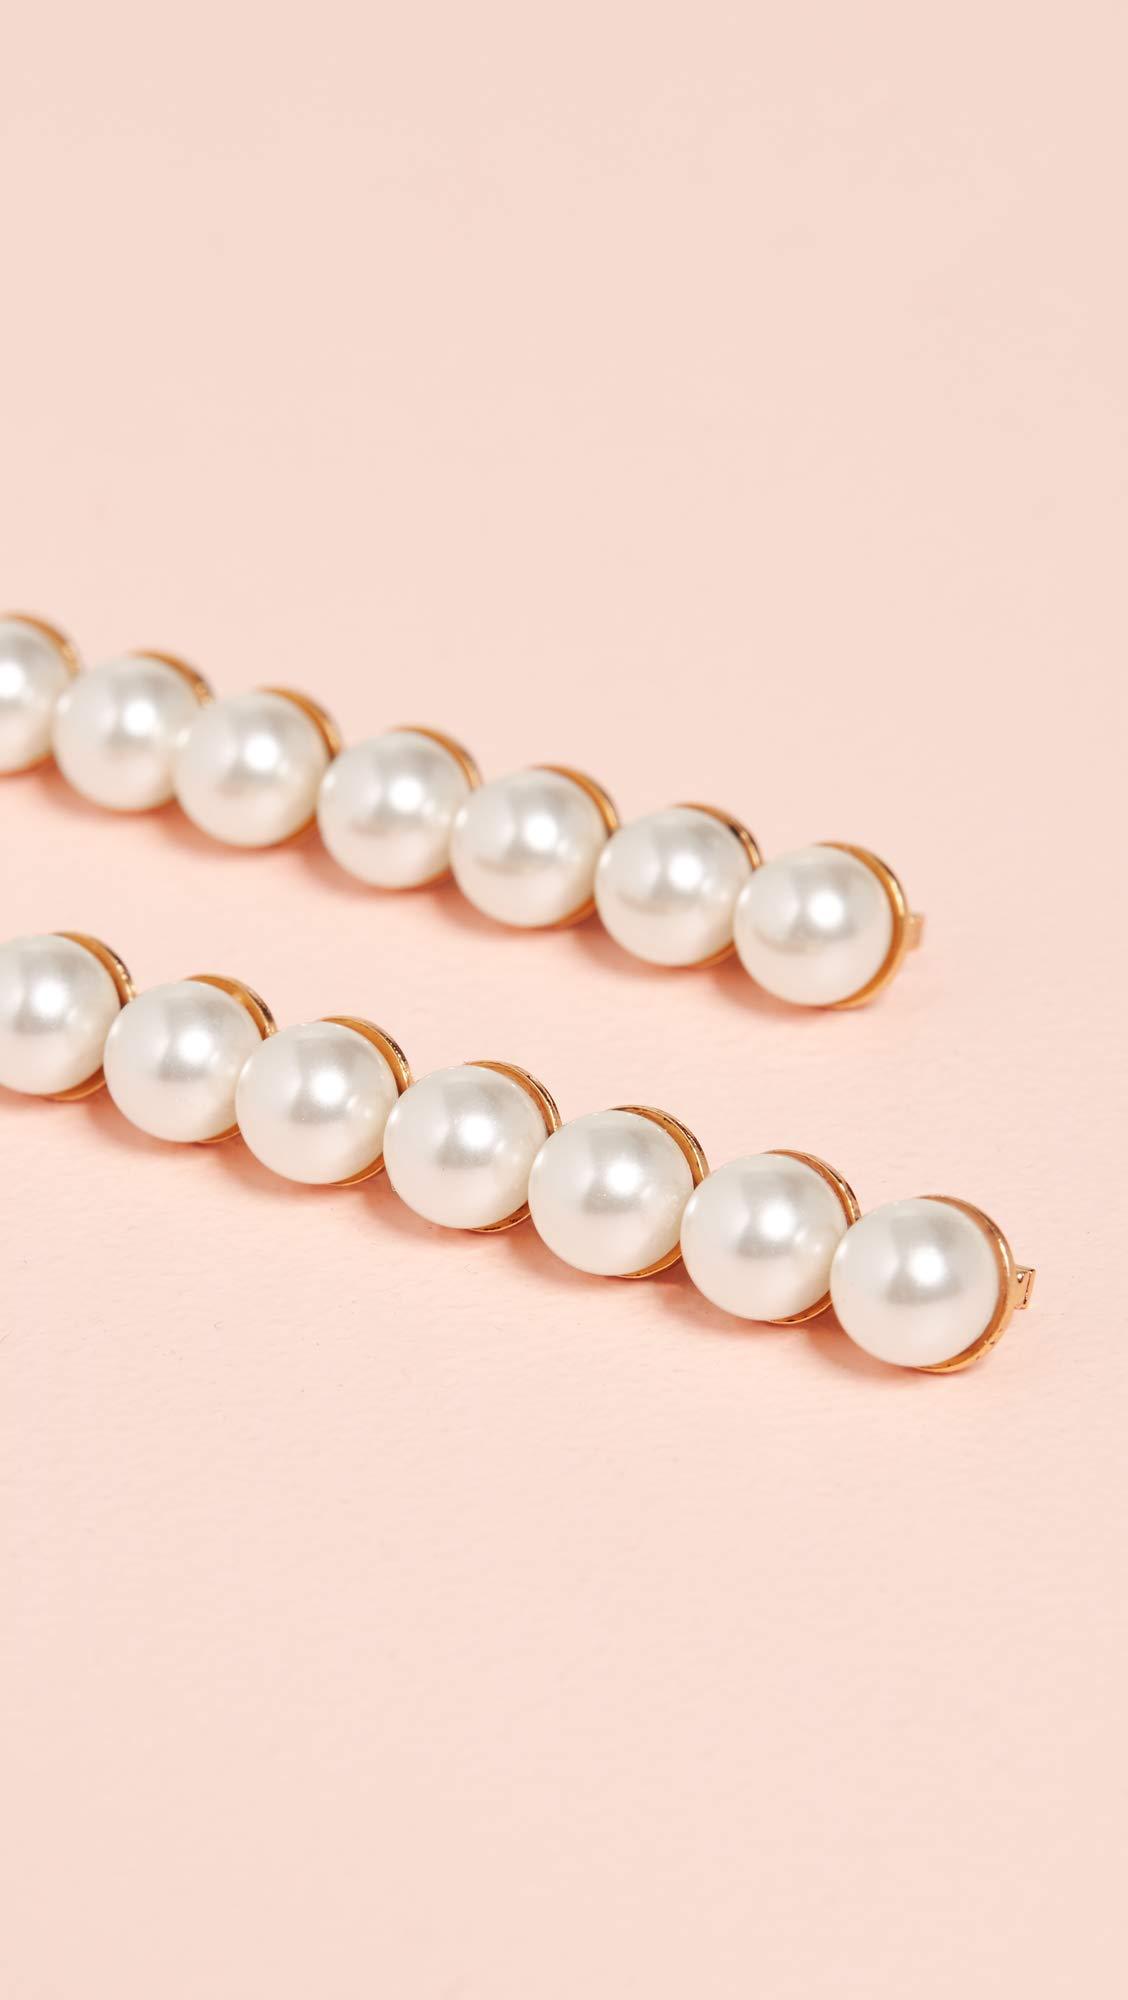 Jennifer Behr Women's Gracie Bobby Pin Set, Pearl, Off White, Gold, One Size by Jennifer Behr (Image #4)